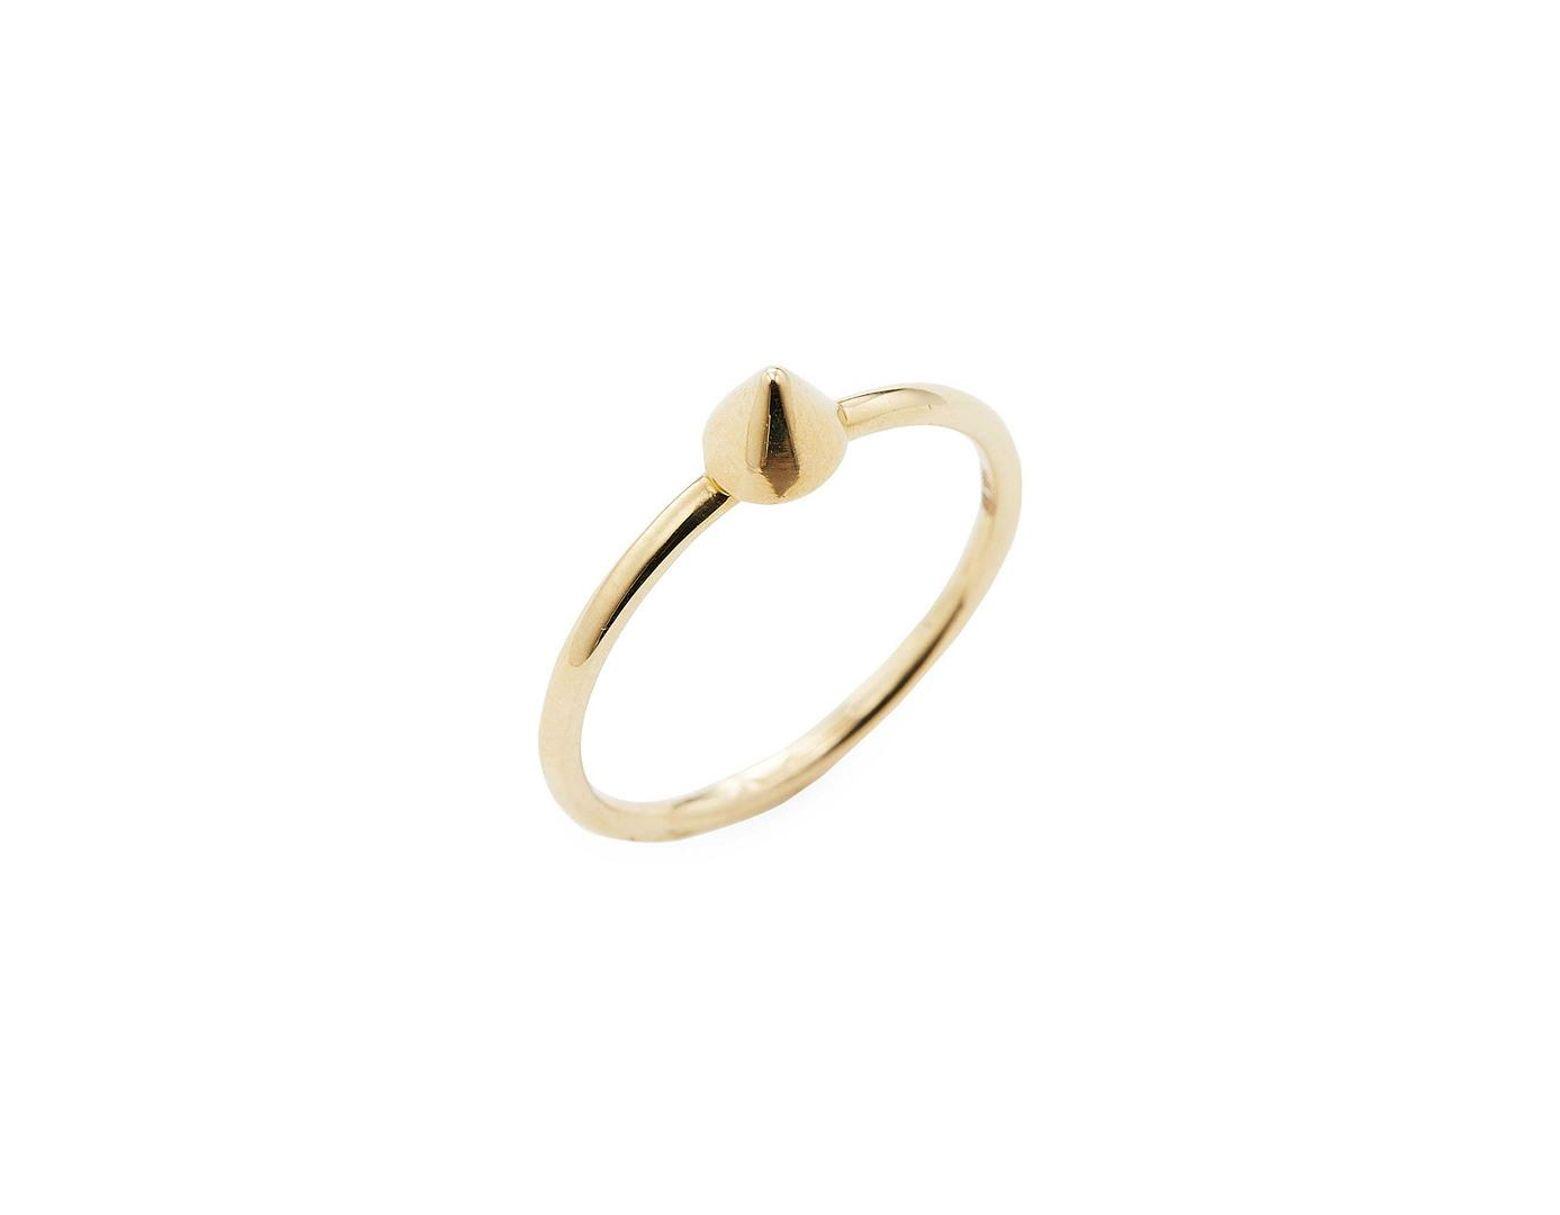 1d352d0b6b207 Sydney Evan Gold Spike Size 6.5 Ring in Metallic - Save 54% - Lyst